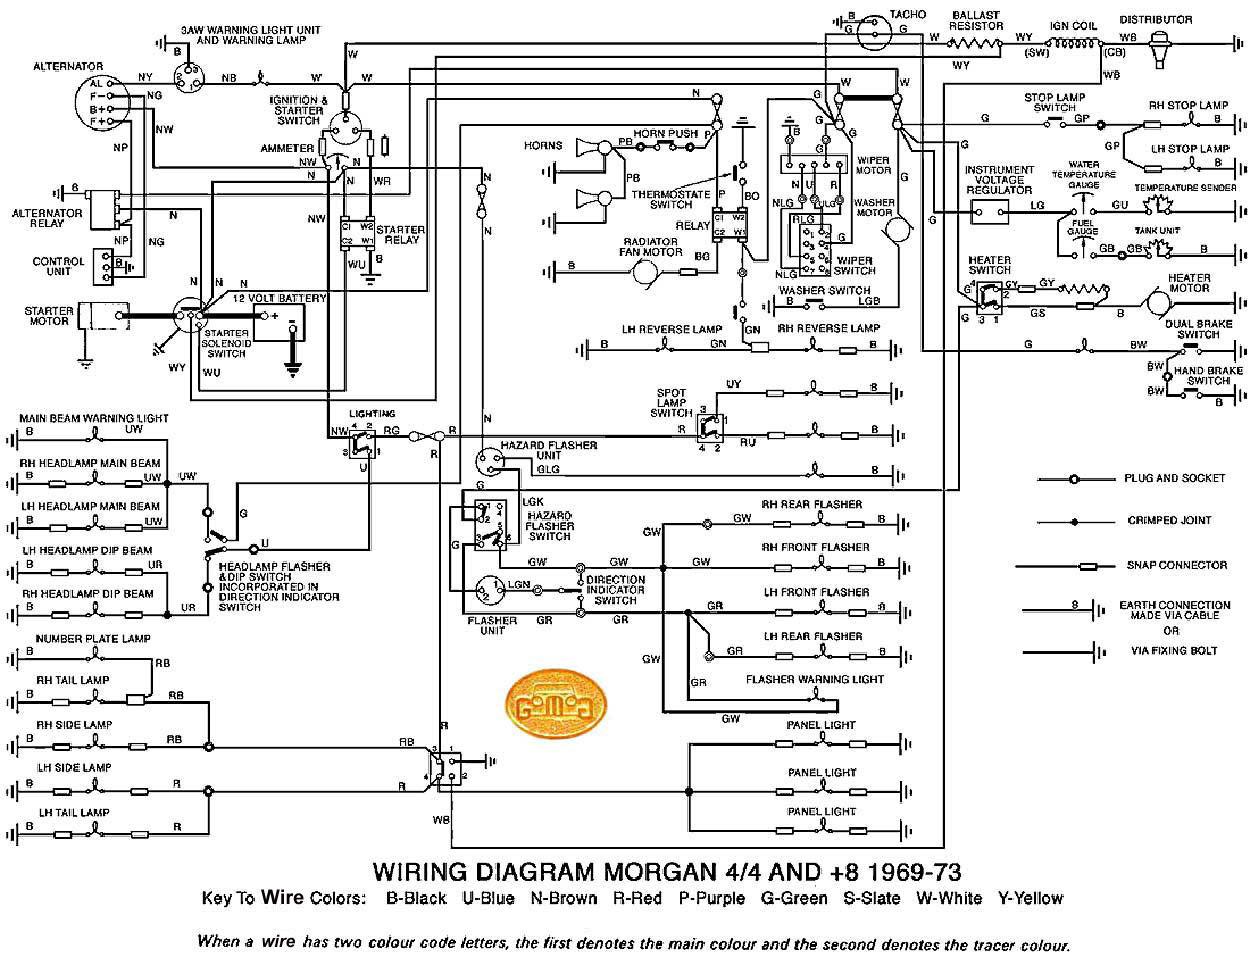 19 Beautiful 69 Camaro Ignition Switch Wiring Diagram